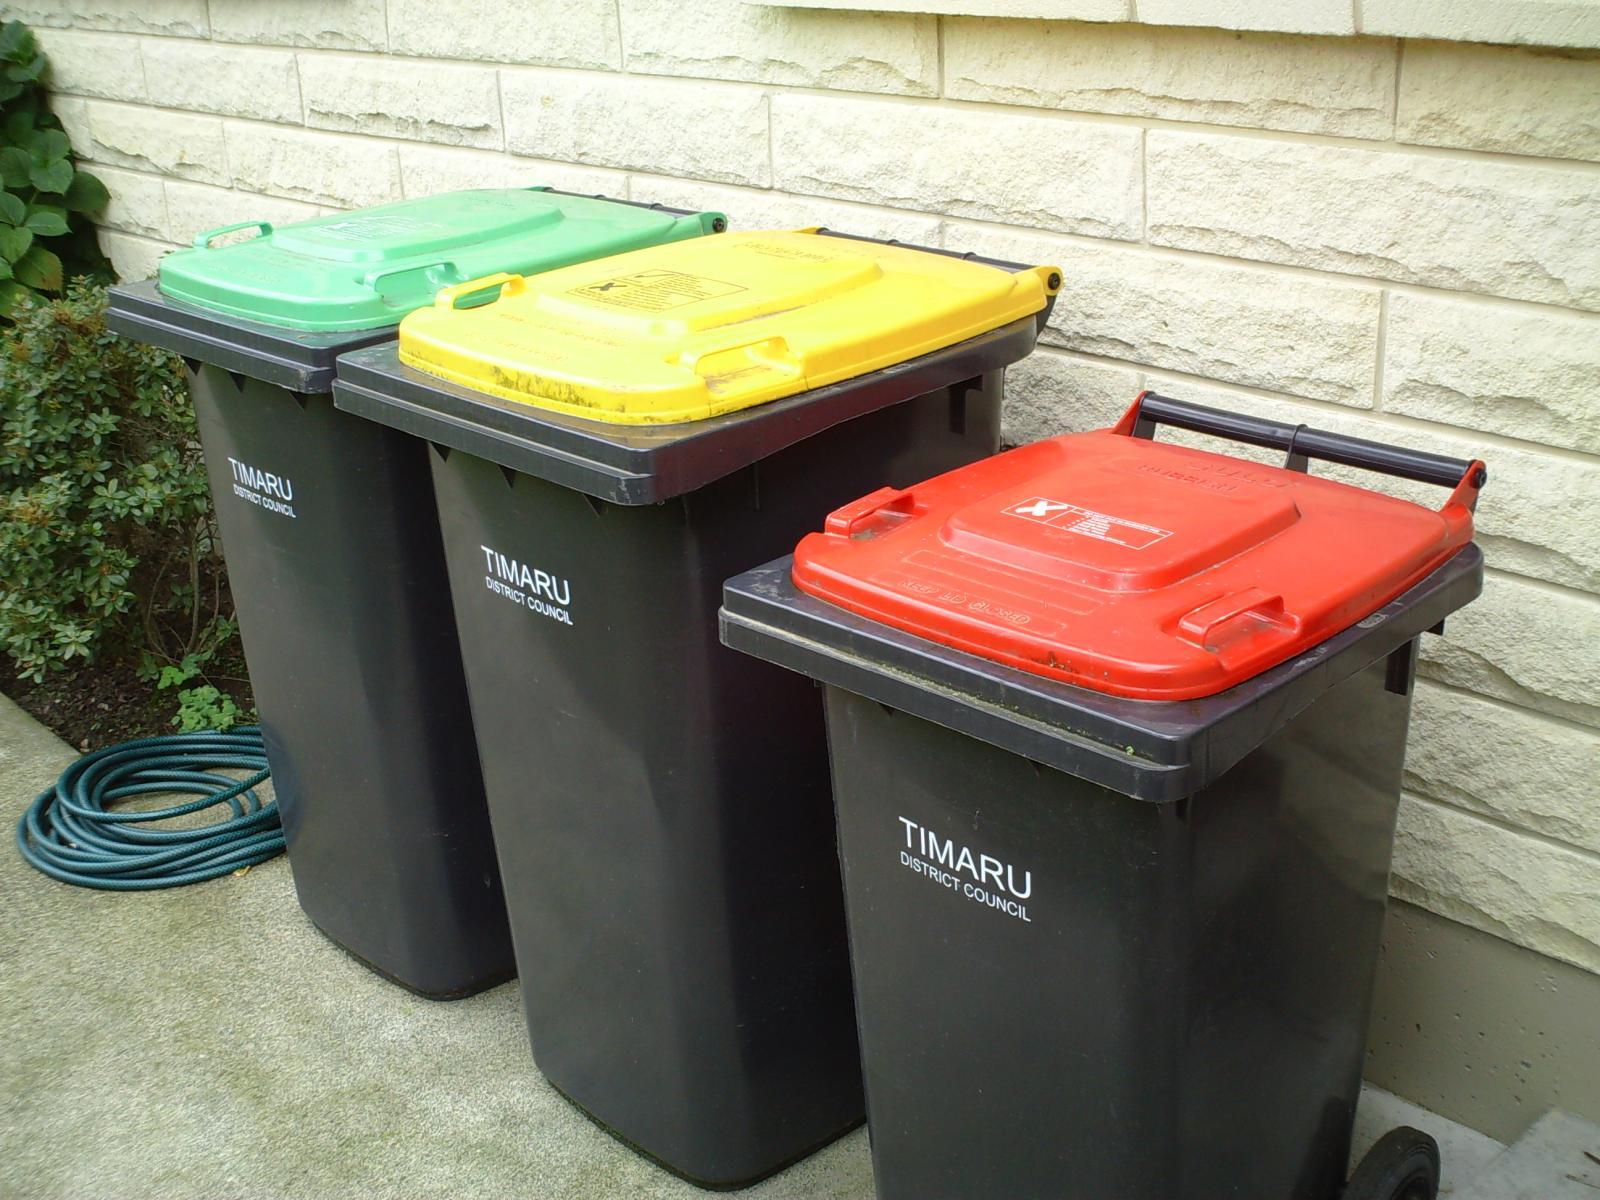 filerubbish and recycling bins trash cans in new zealandjpg